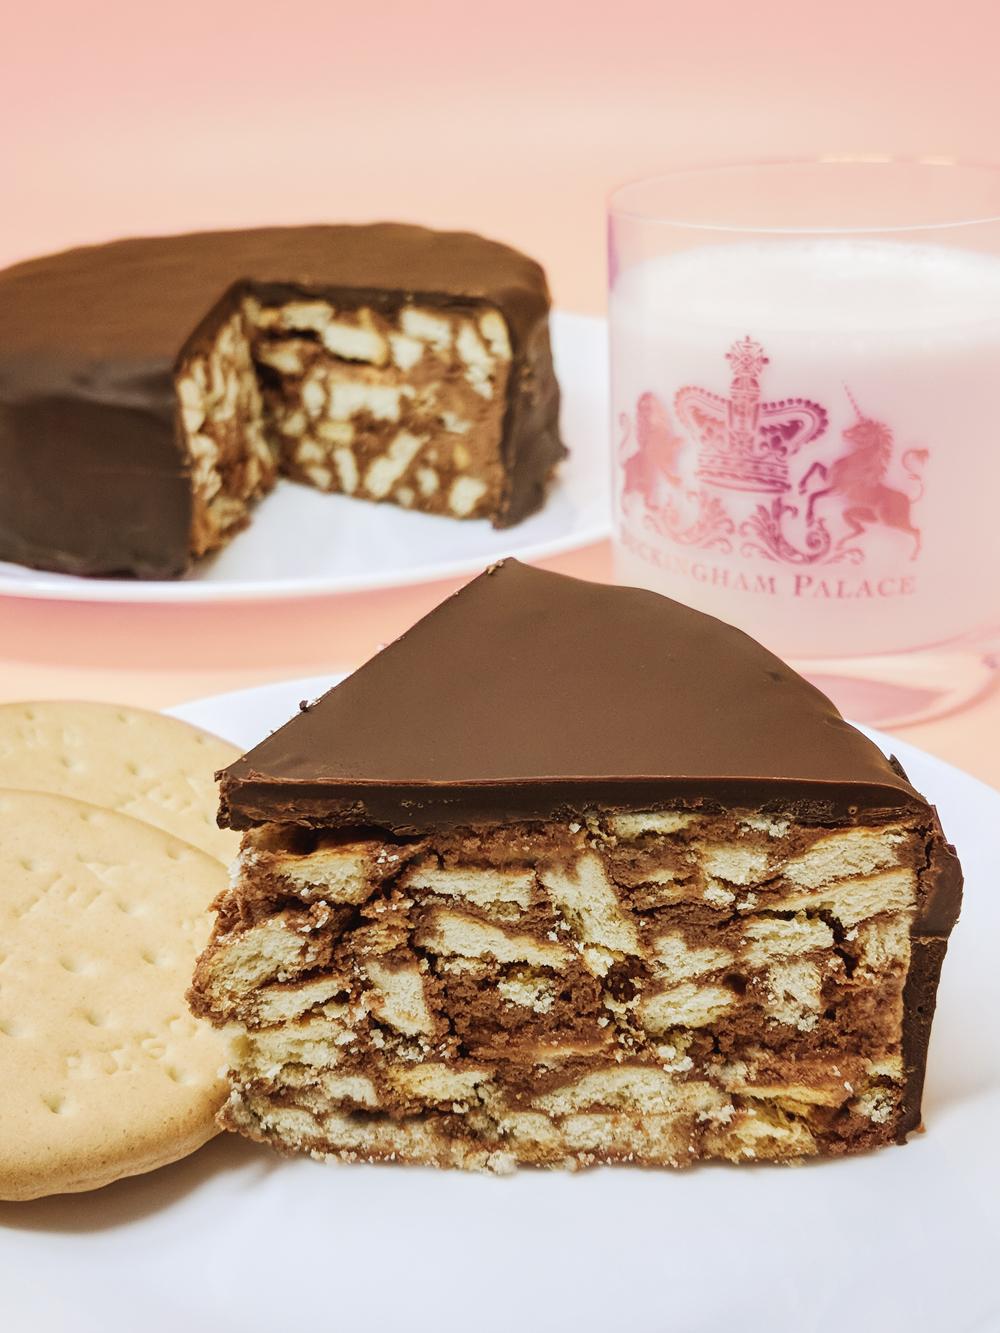 Queen Elizabeth S Favorite Cake Made Vegan Somethingsosam